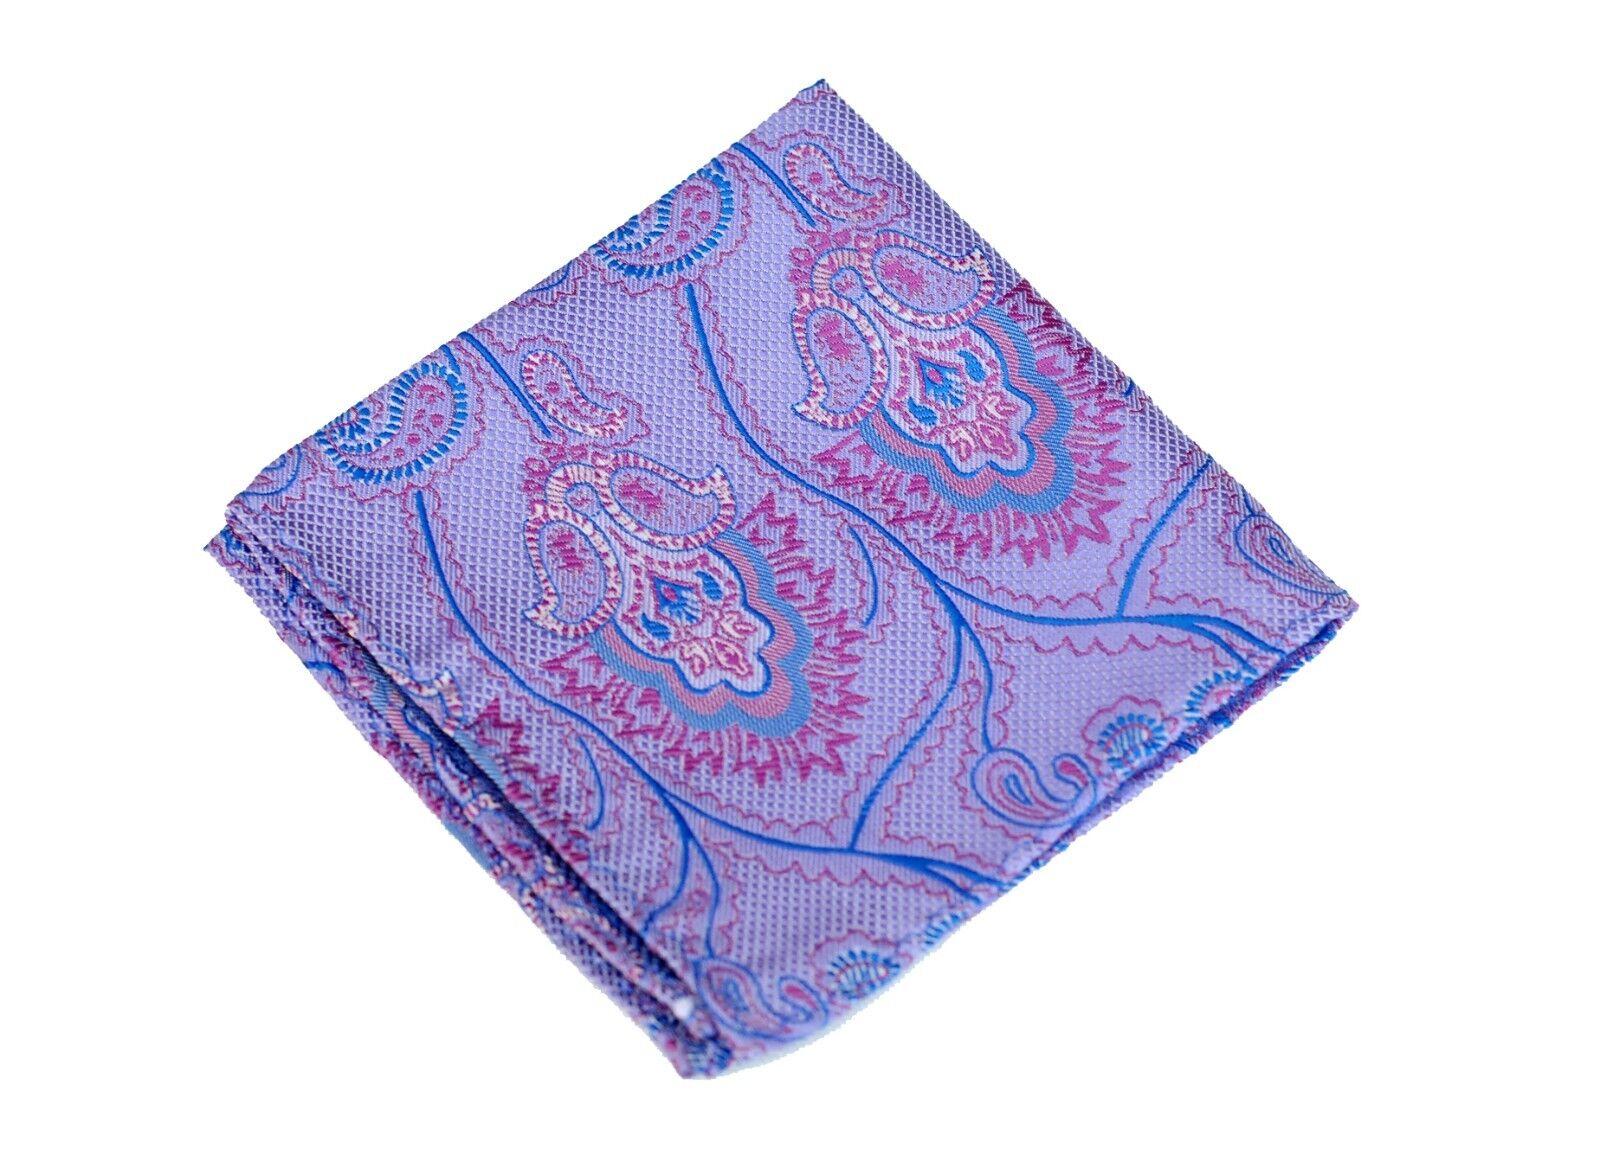 Lord R Colton Masterworks Pocket Square - Trindade Coastal Purple - New